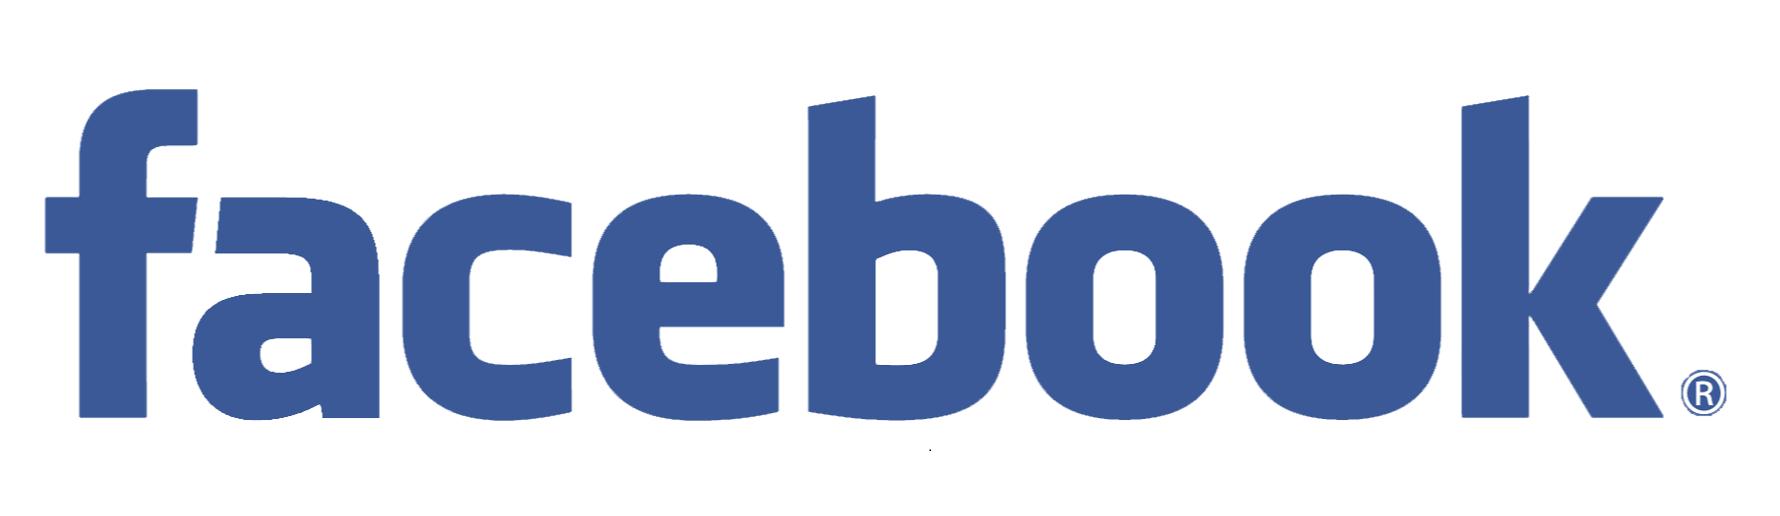 Facebook clipart transparent background svg download Facebook Logo Png - Free Icons and PNG Backgrounds svg download